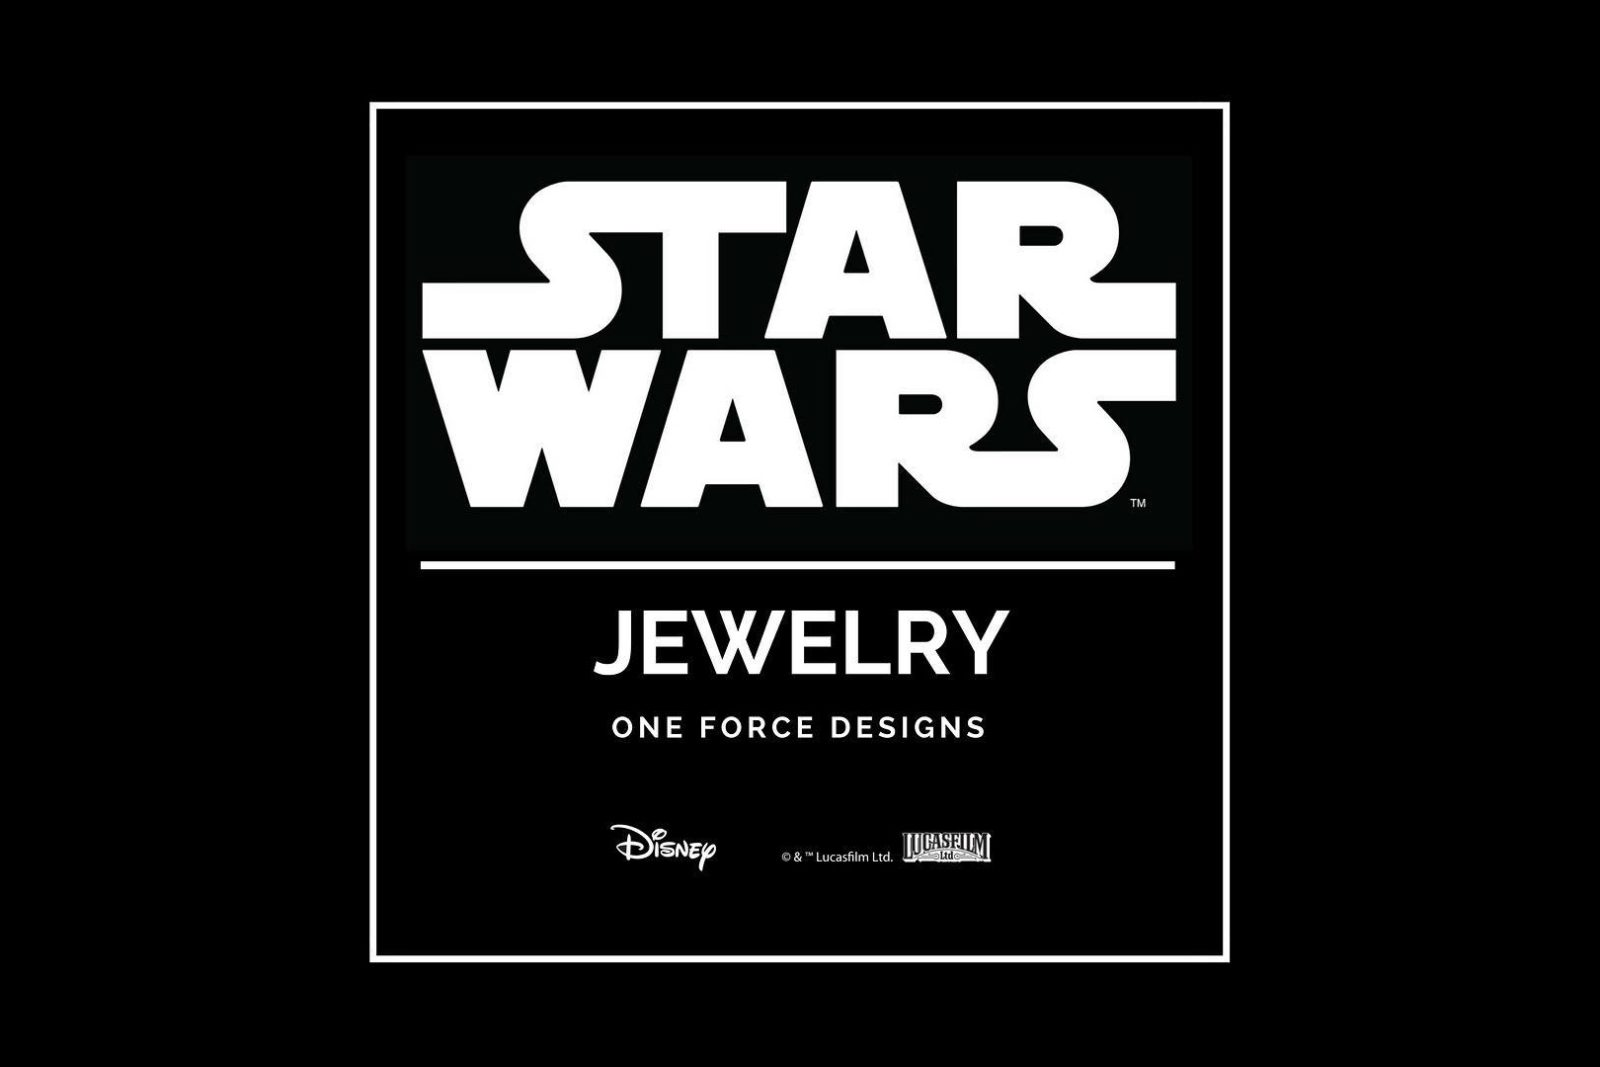 One Force Designs x Star Wars Jewelry